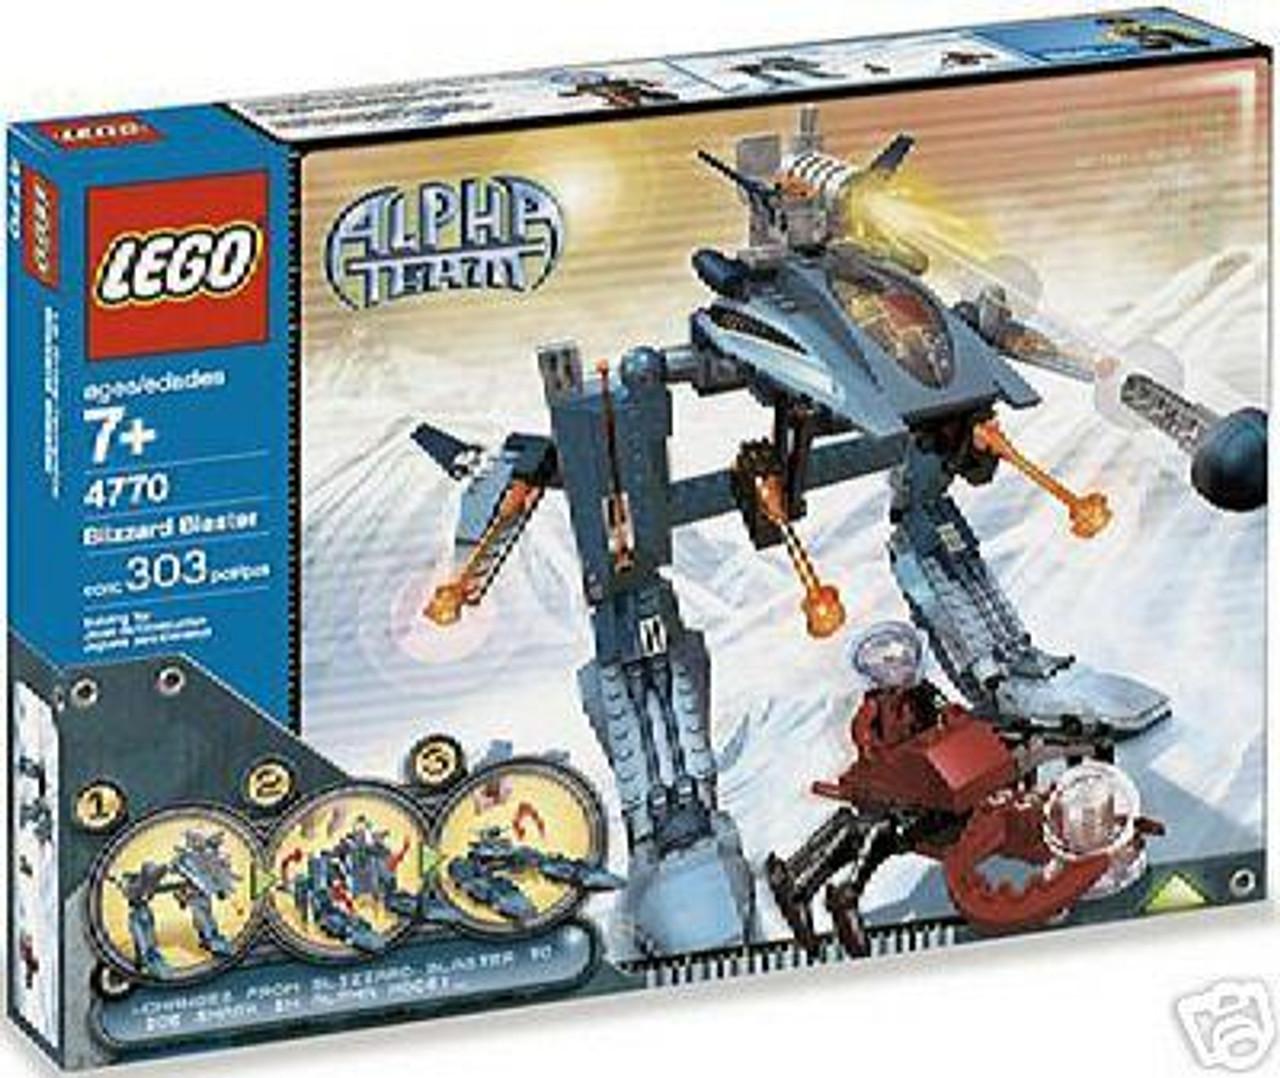 LEGO Alpha Team Blizzard Blaster Set #4770